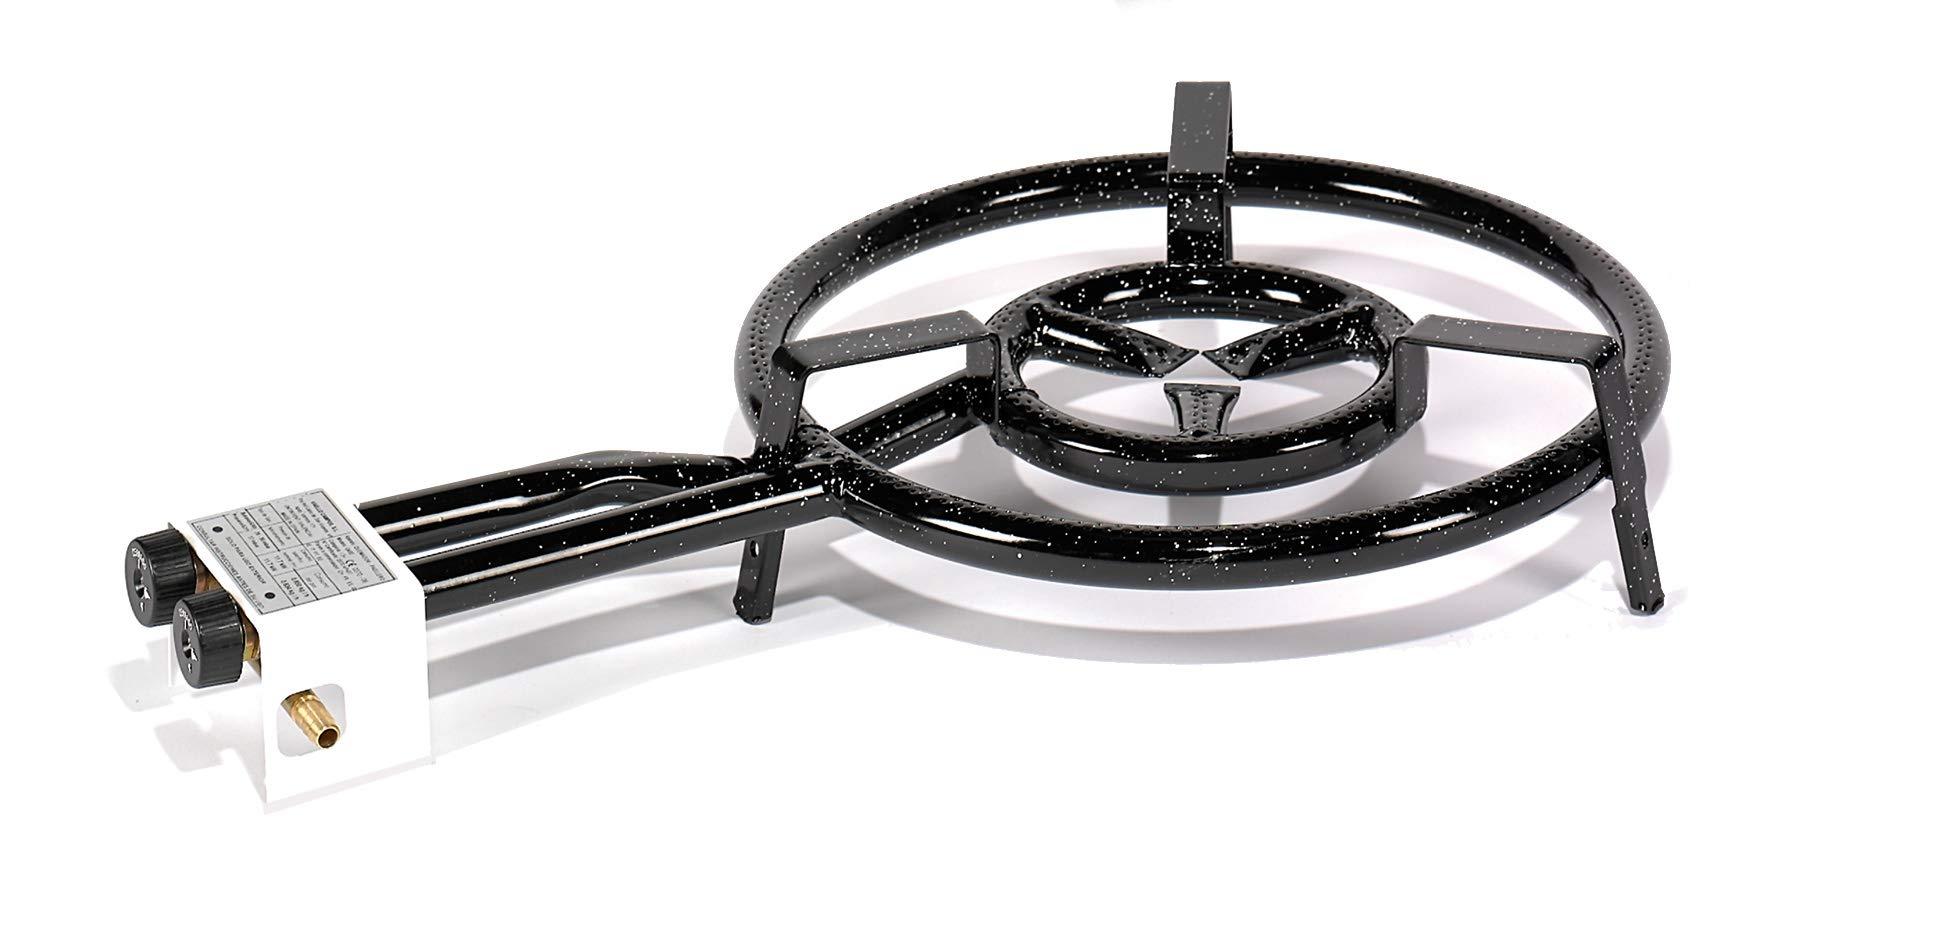 Castevia Paella Gas Burner Two Rings 16Inch - 400 mm